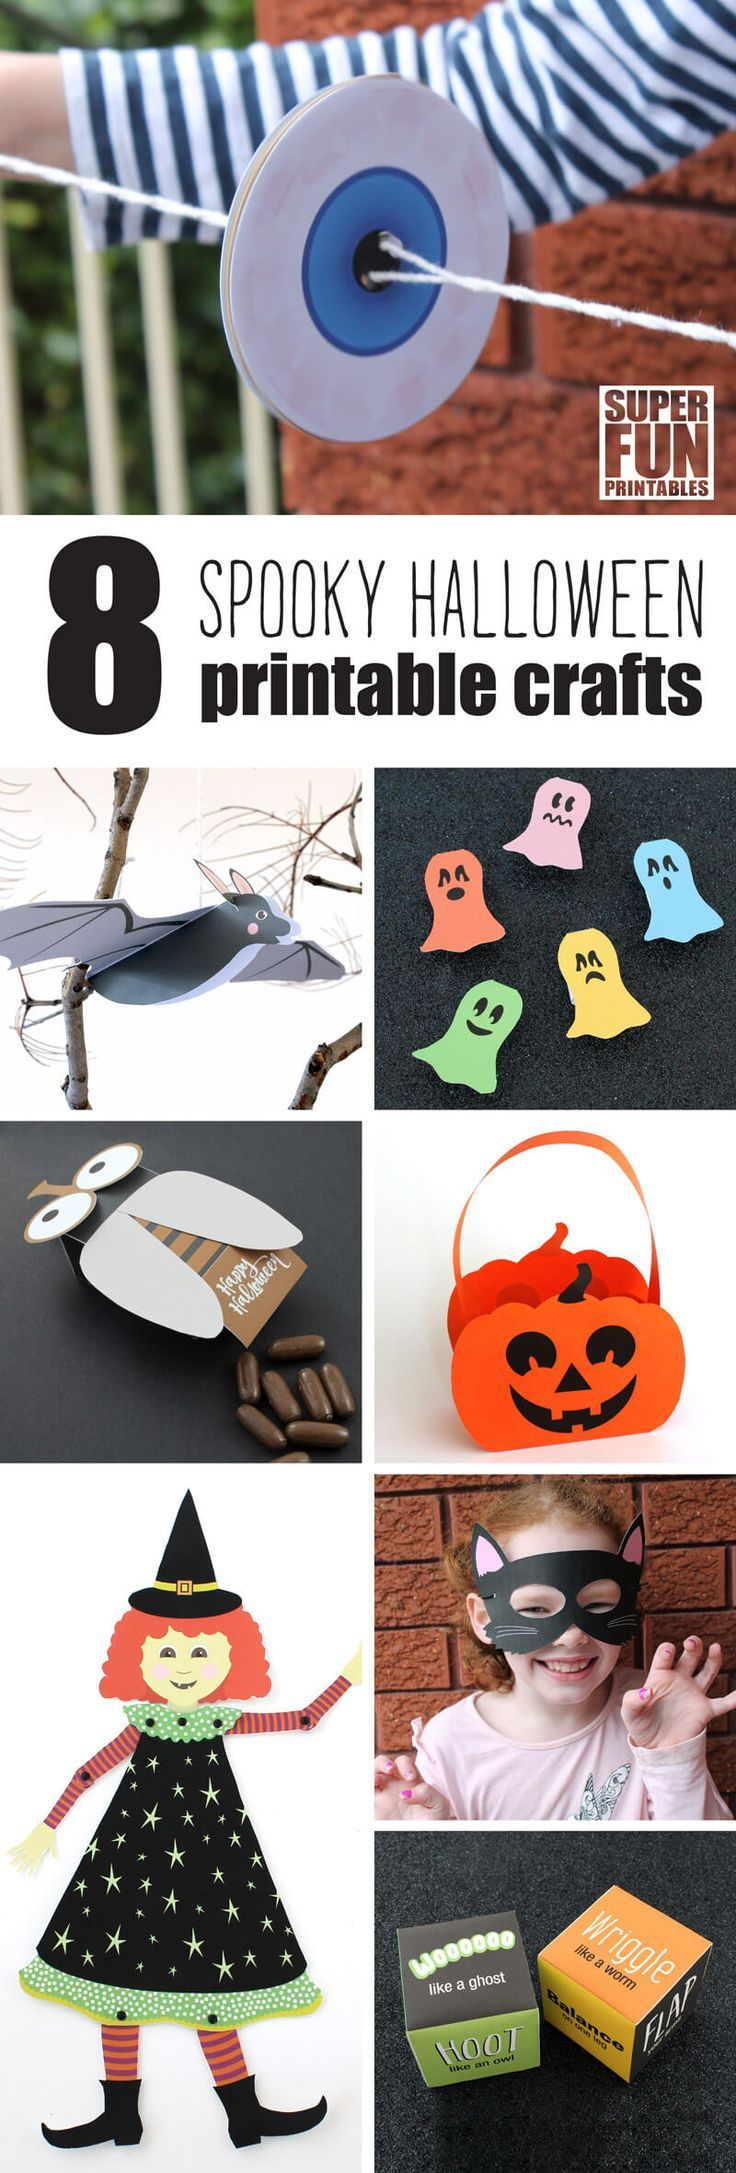 8 Spooky printable Halloween craft ideas for kids